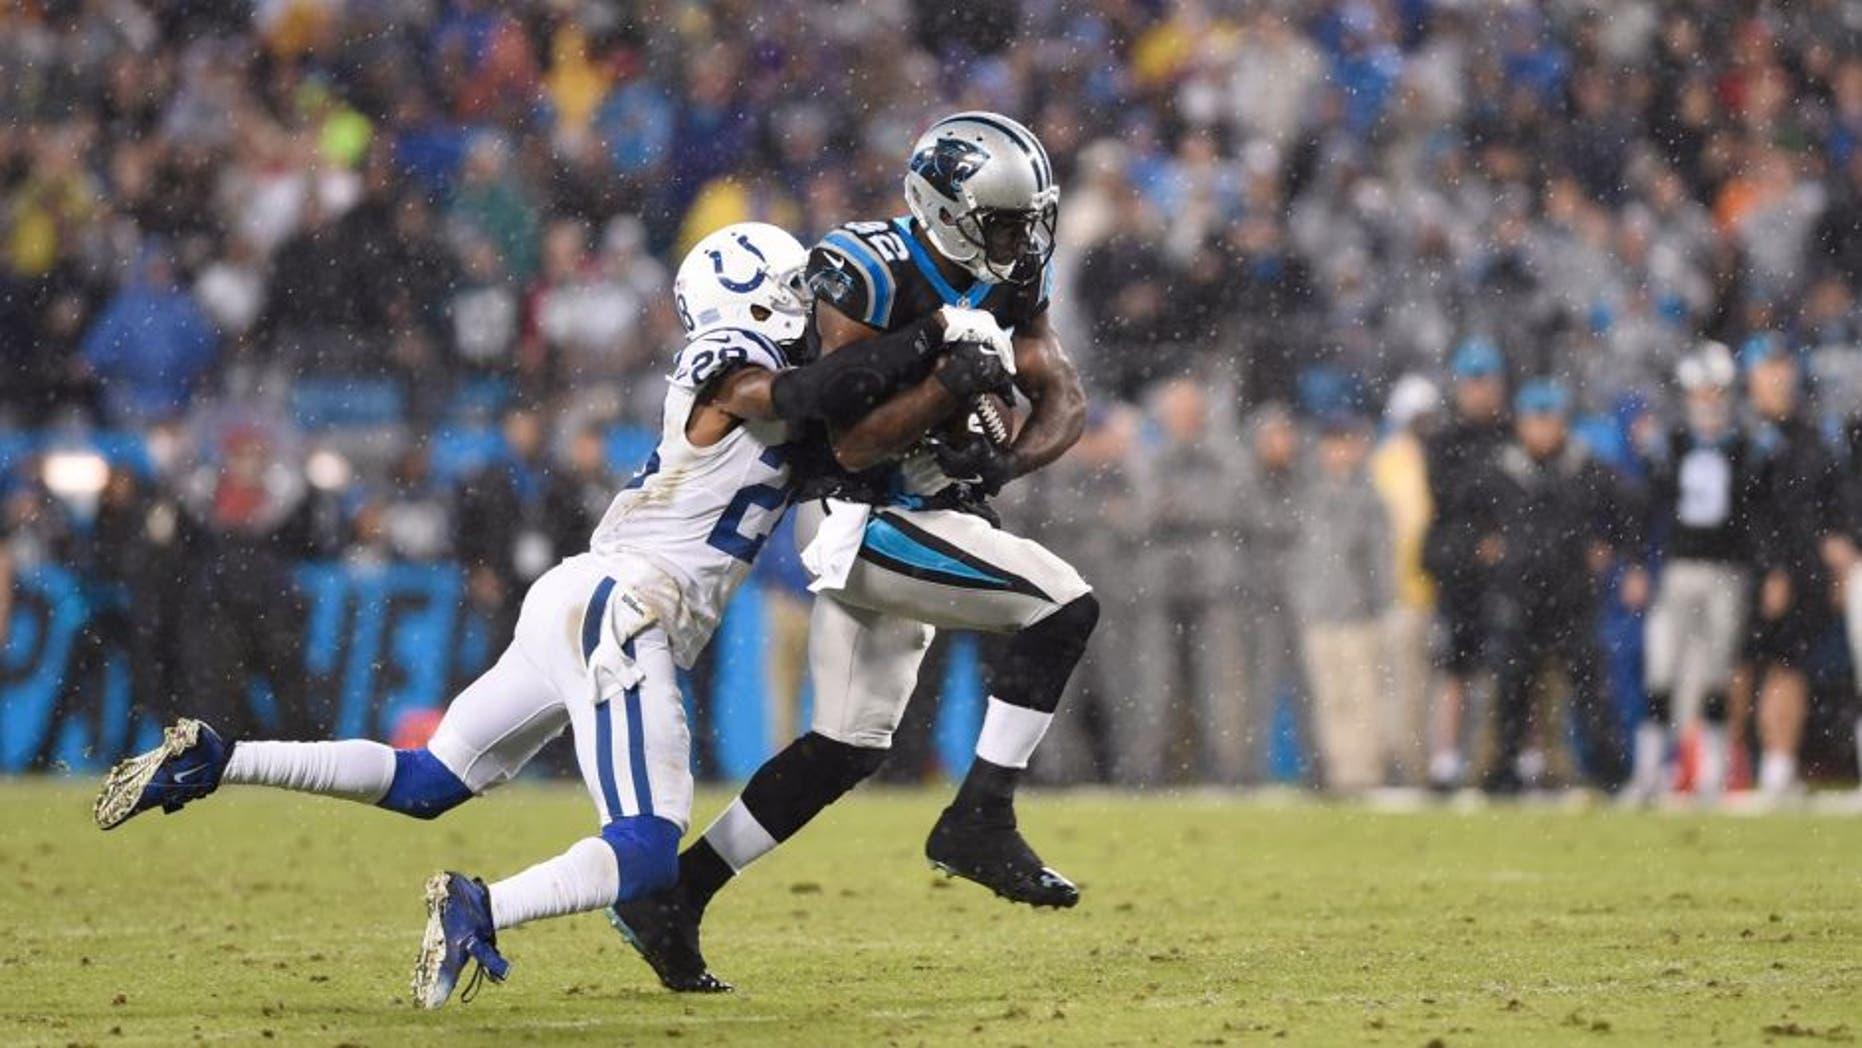 Nov 2, 2015; Charlotte, NC, USA; Carolina Panthers running back Jonathan Stewart (28) runs as Indianapolis Colts cornerback Greg Toler (28) defends in the first quarter at Bank of America Stadium. Mandatory Credit: Bob Donnan-USA TODAY Sports